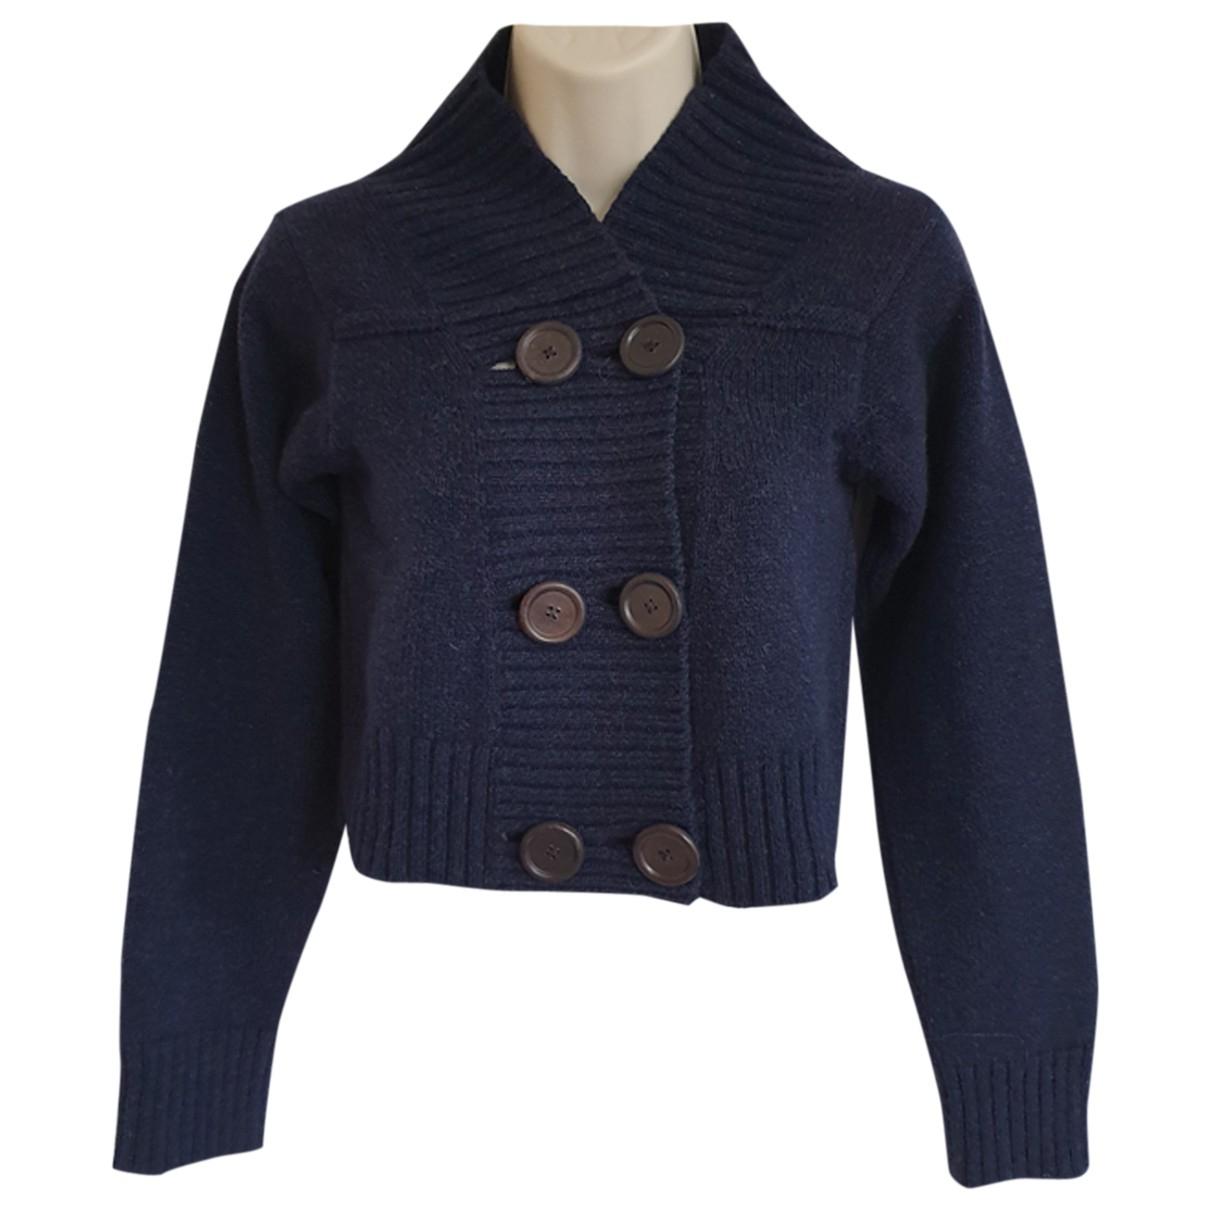 Chloe - Pull   pour femme en laine - marine